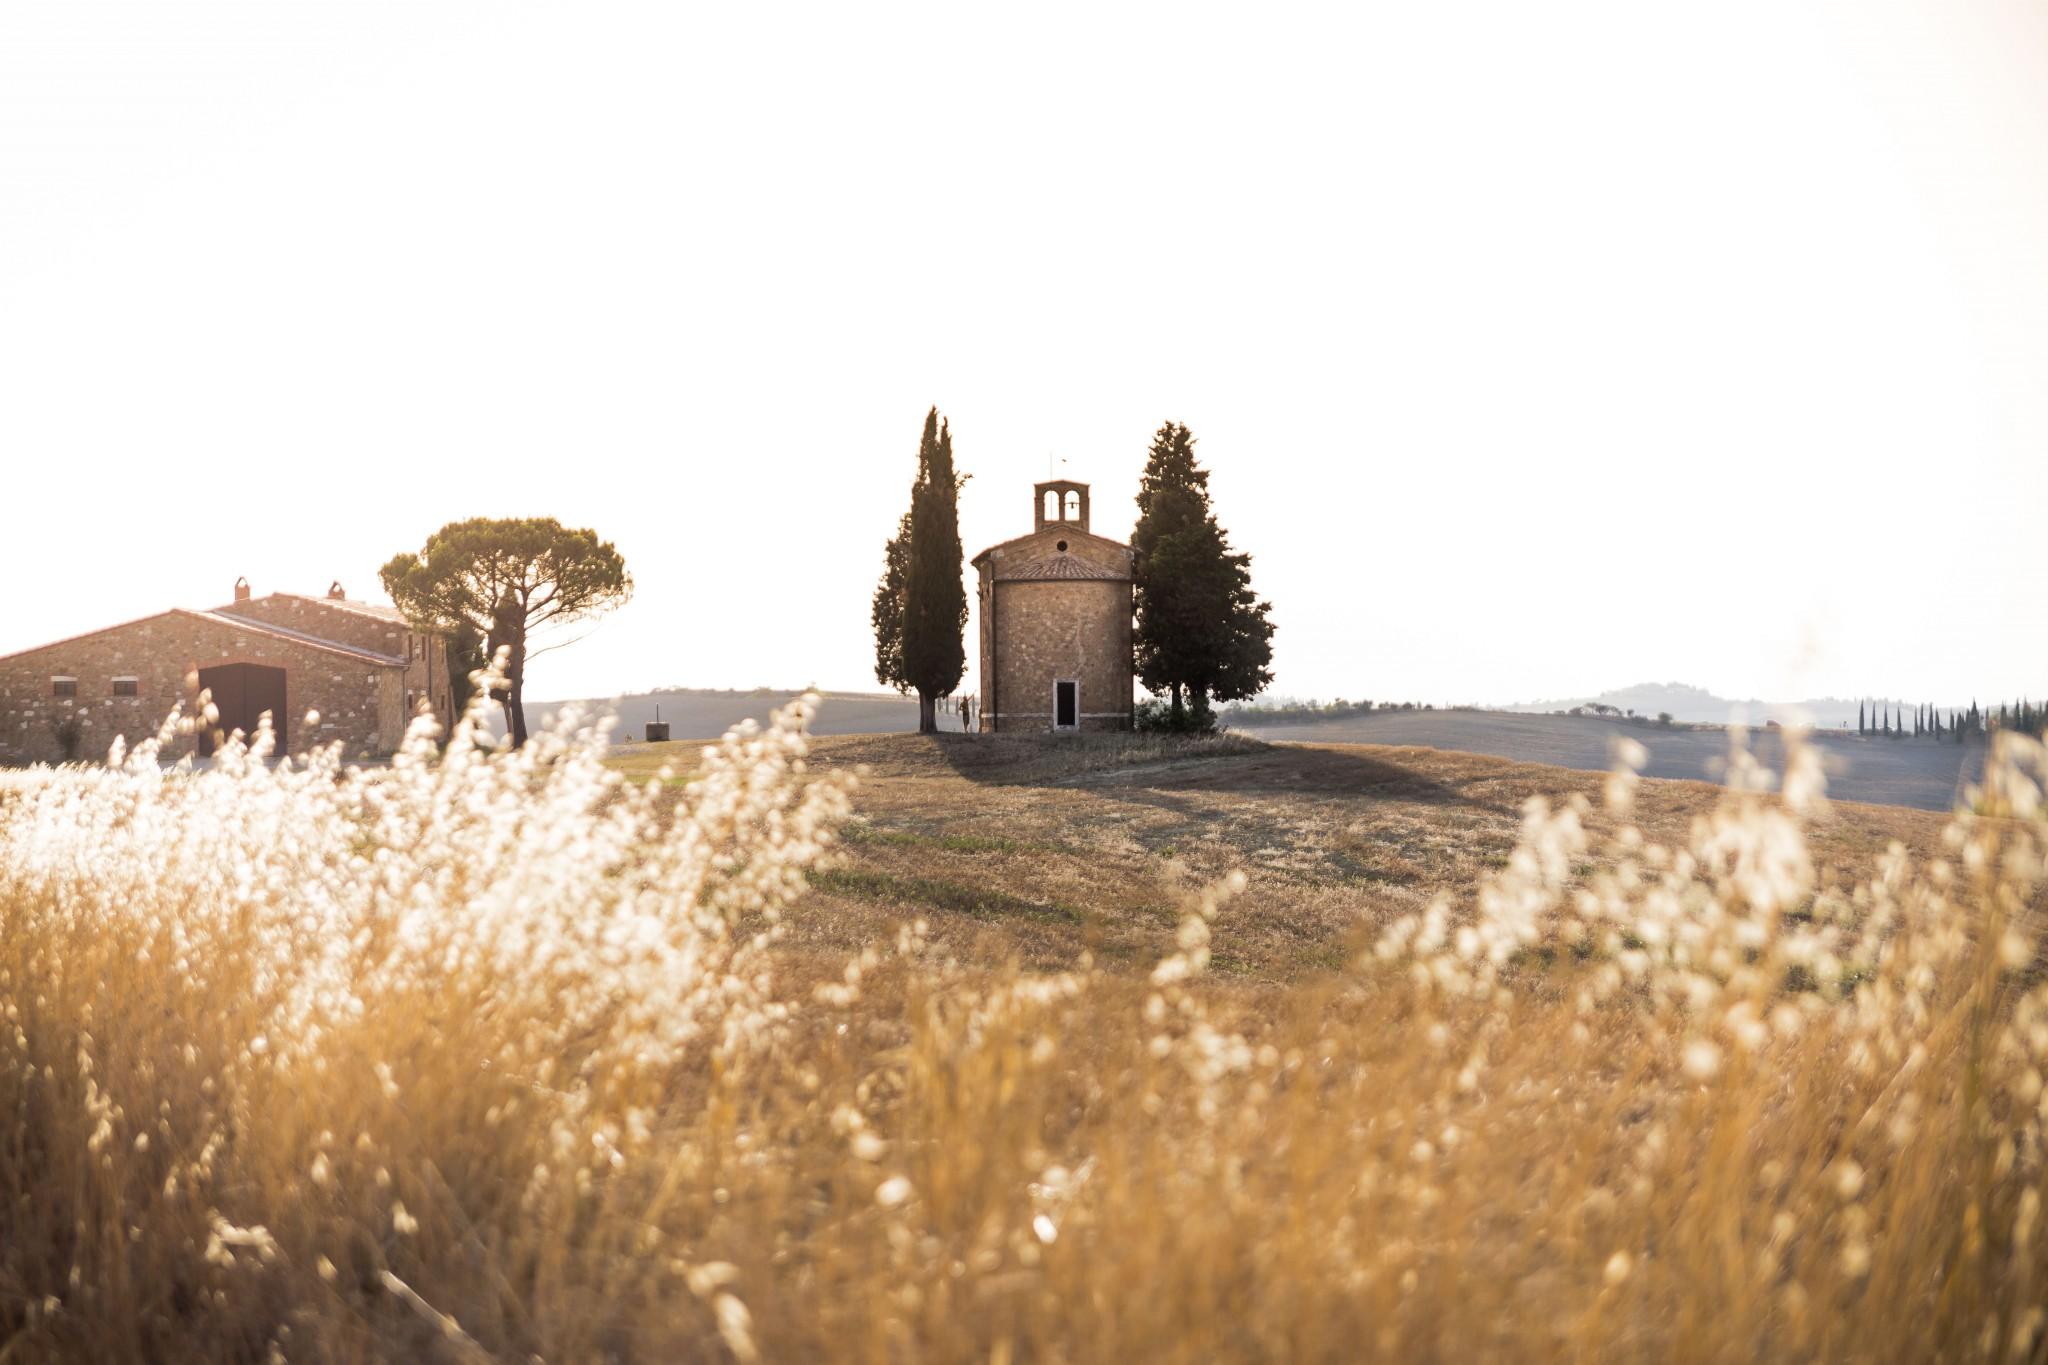 tuscany2 (30 of 39)